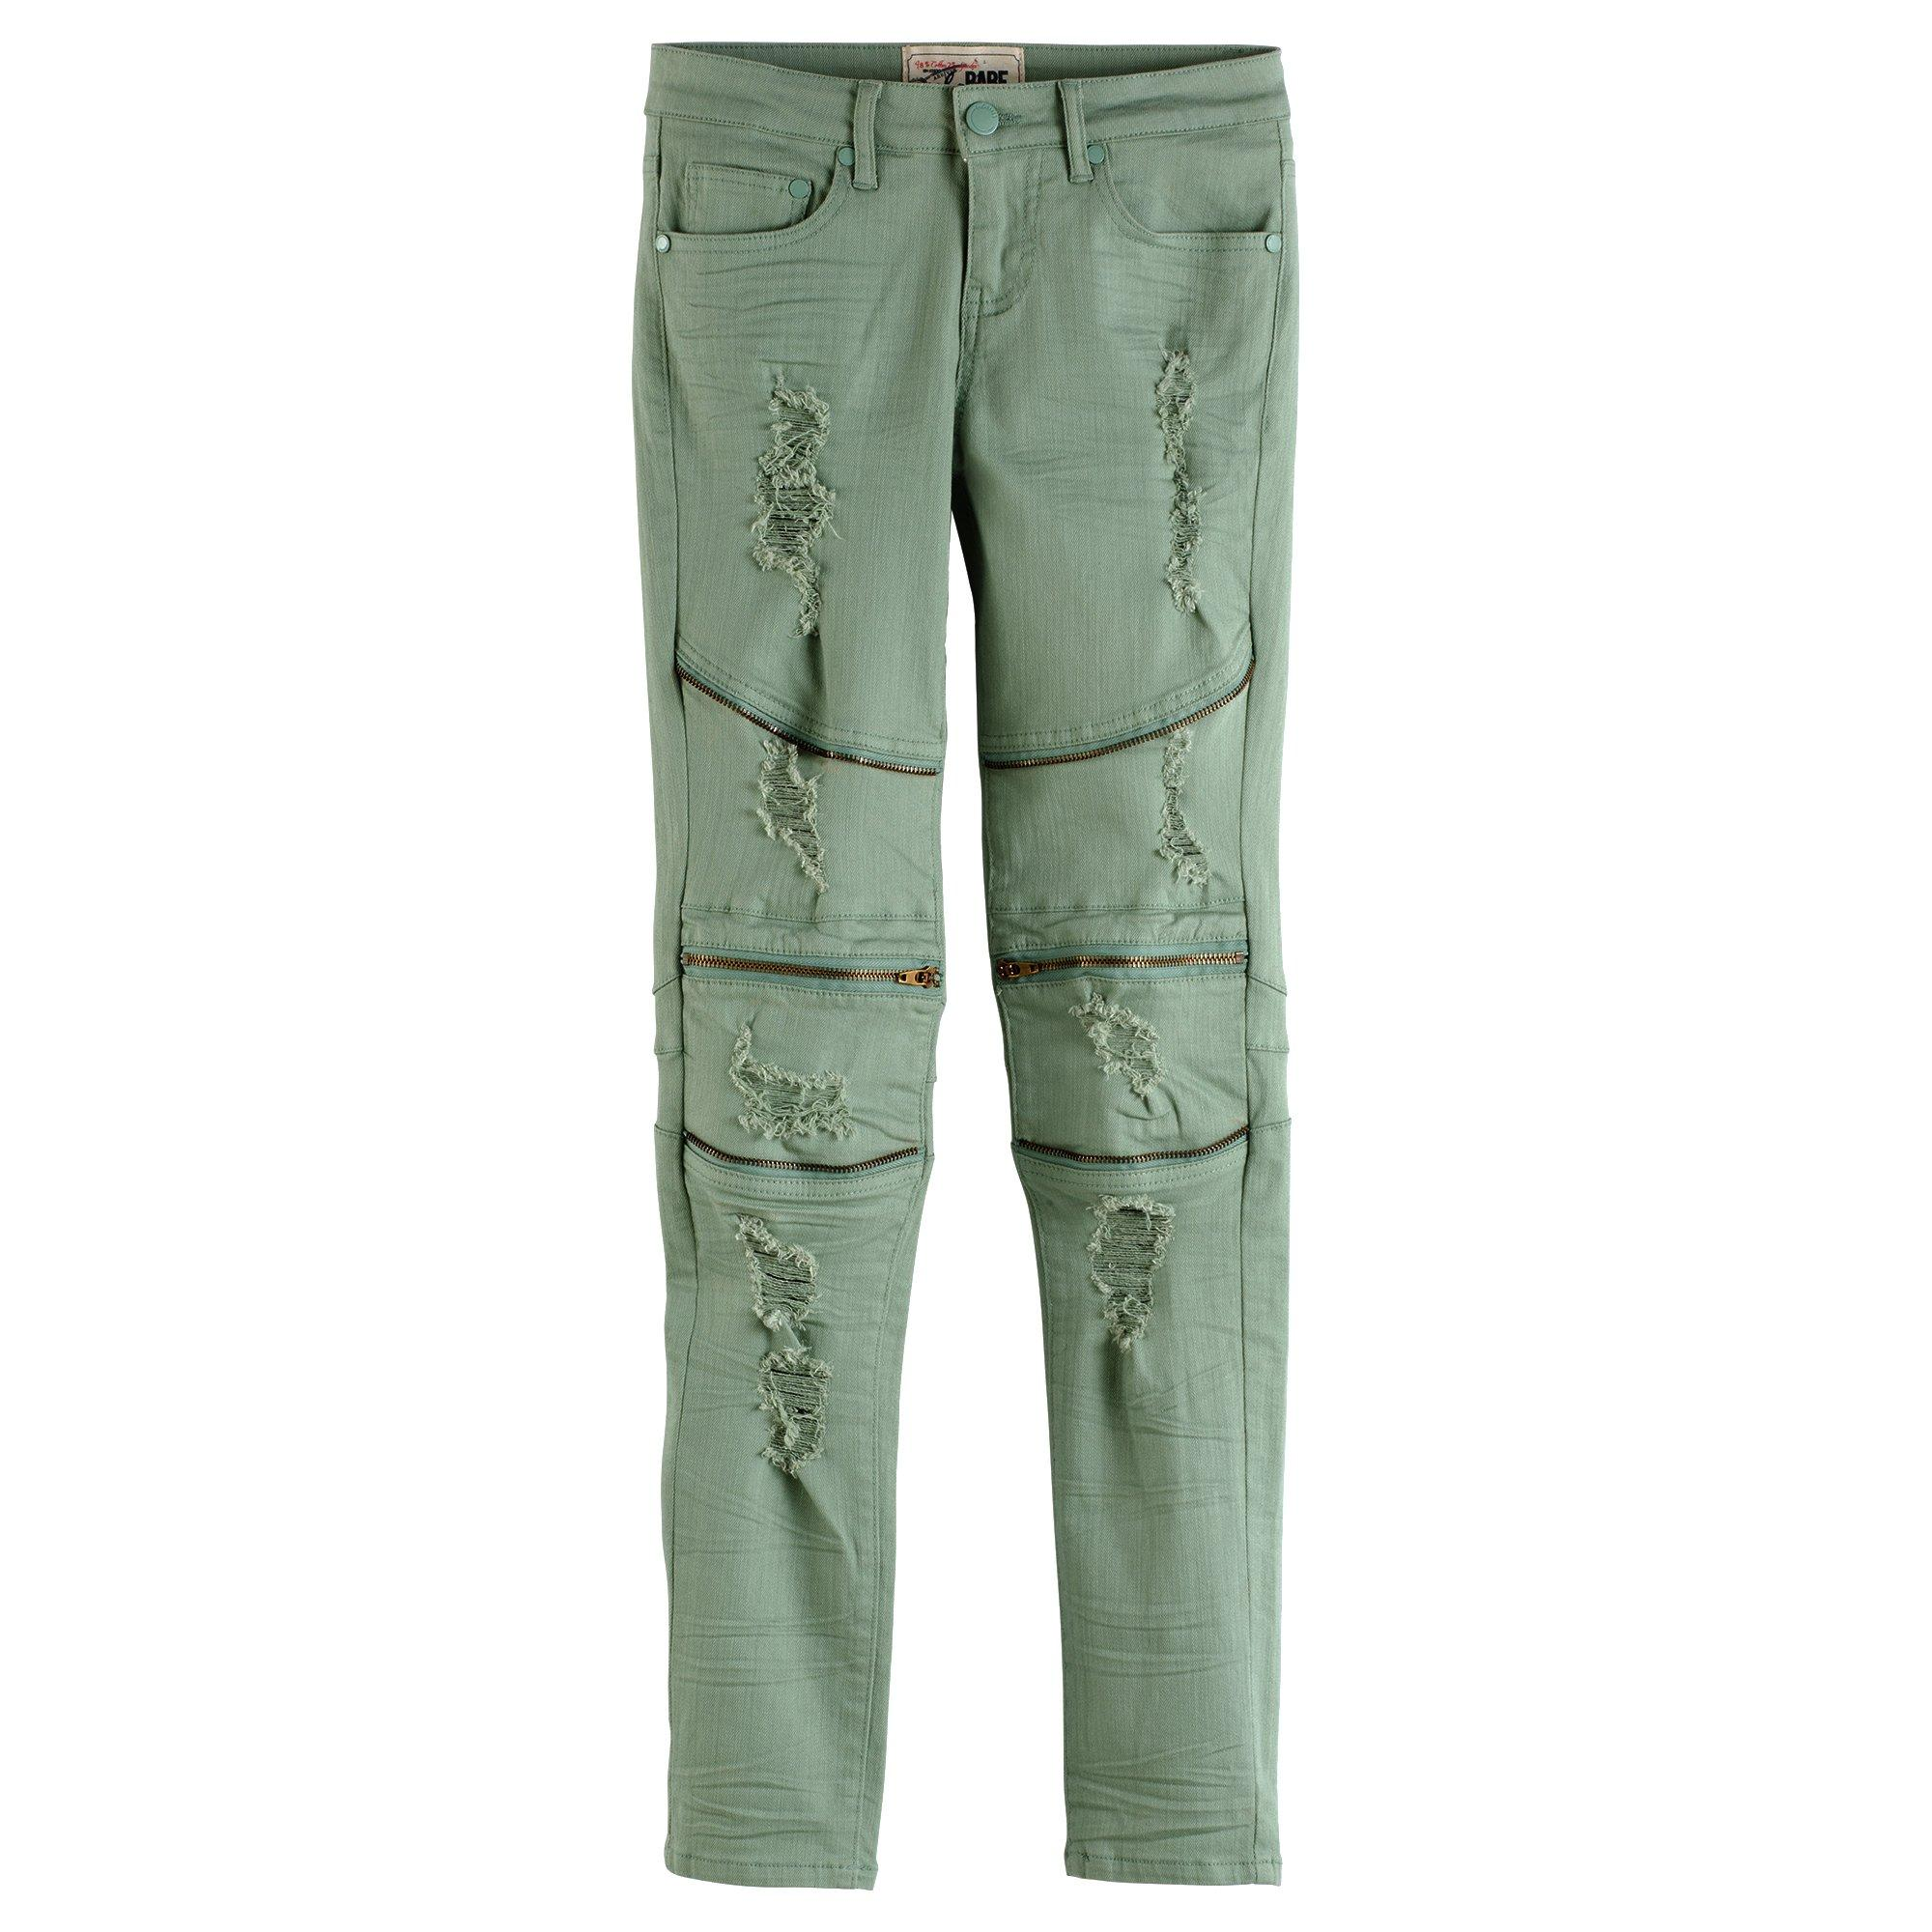 moto pants womens. soho babe women\u0027s destroyed moto jean - main container image 1 pants womens